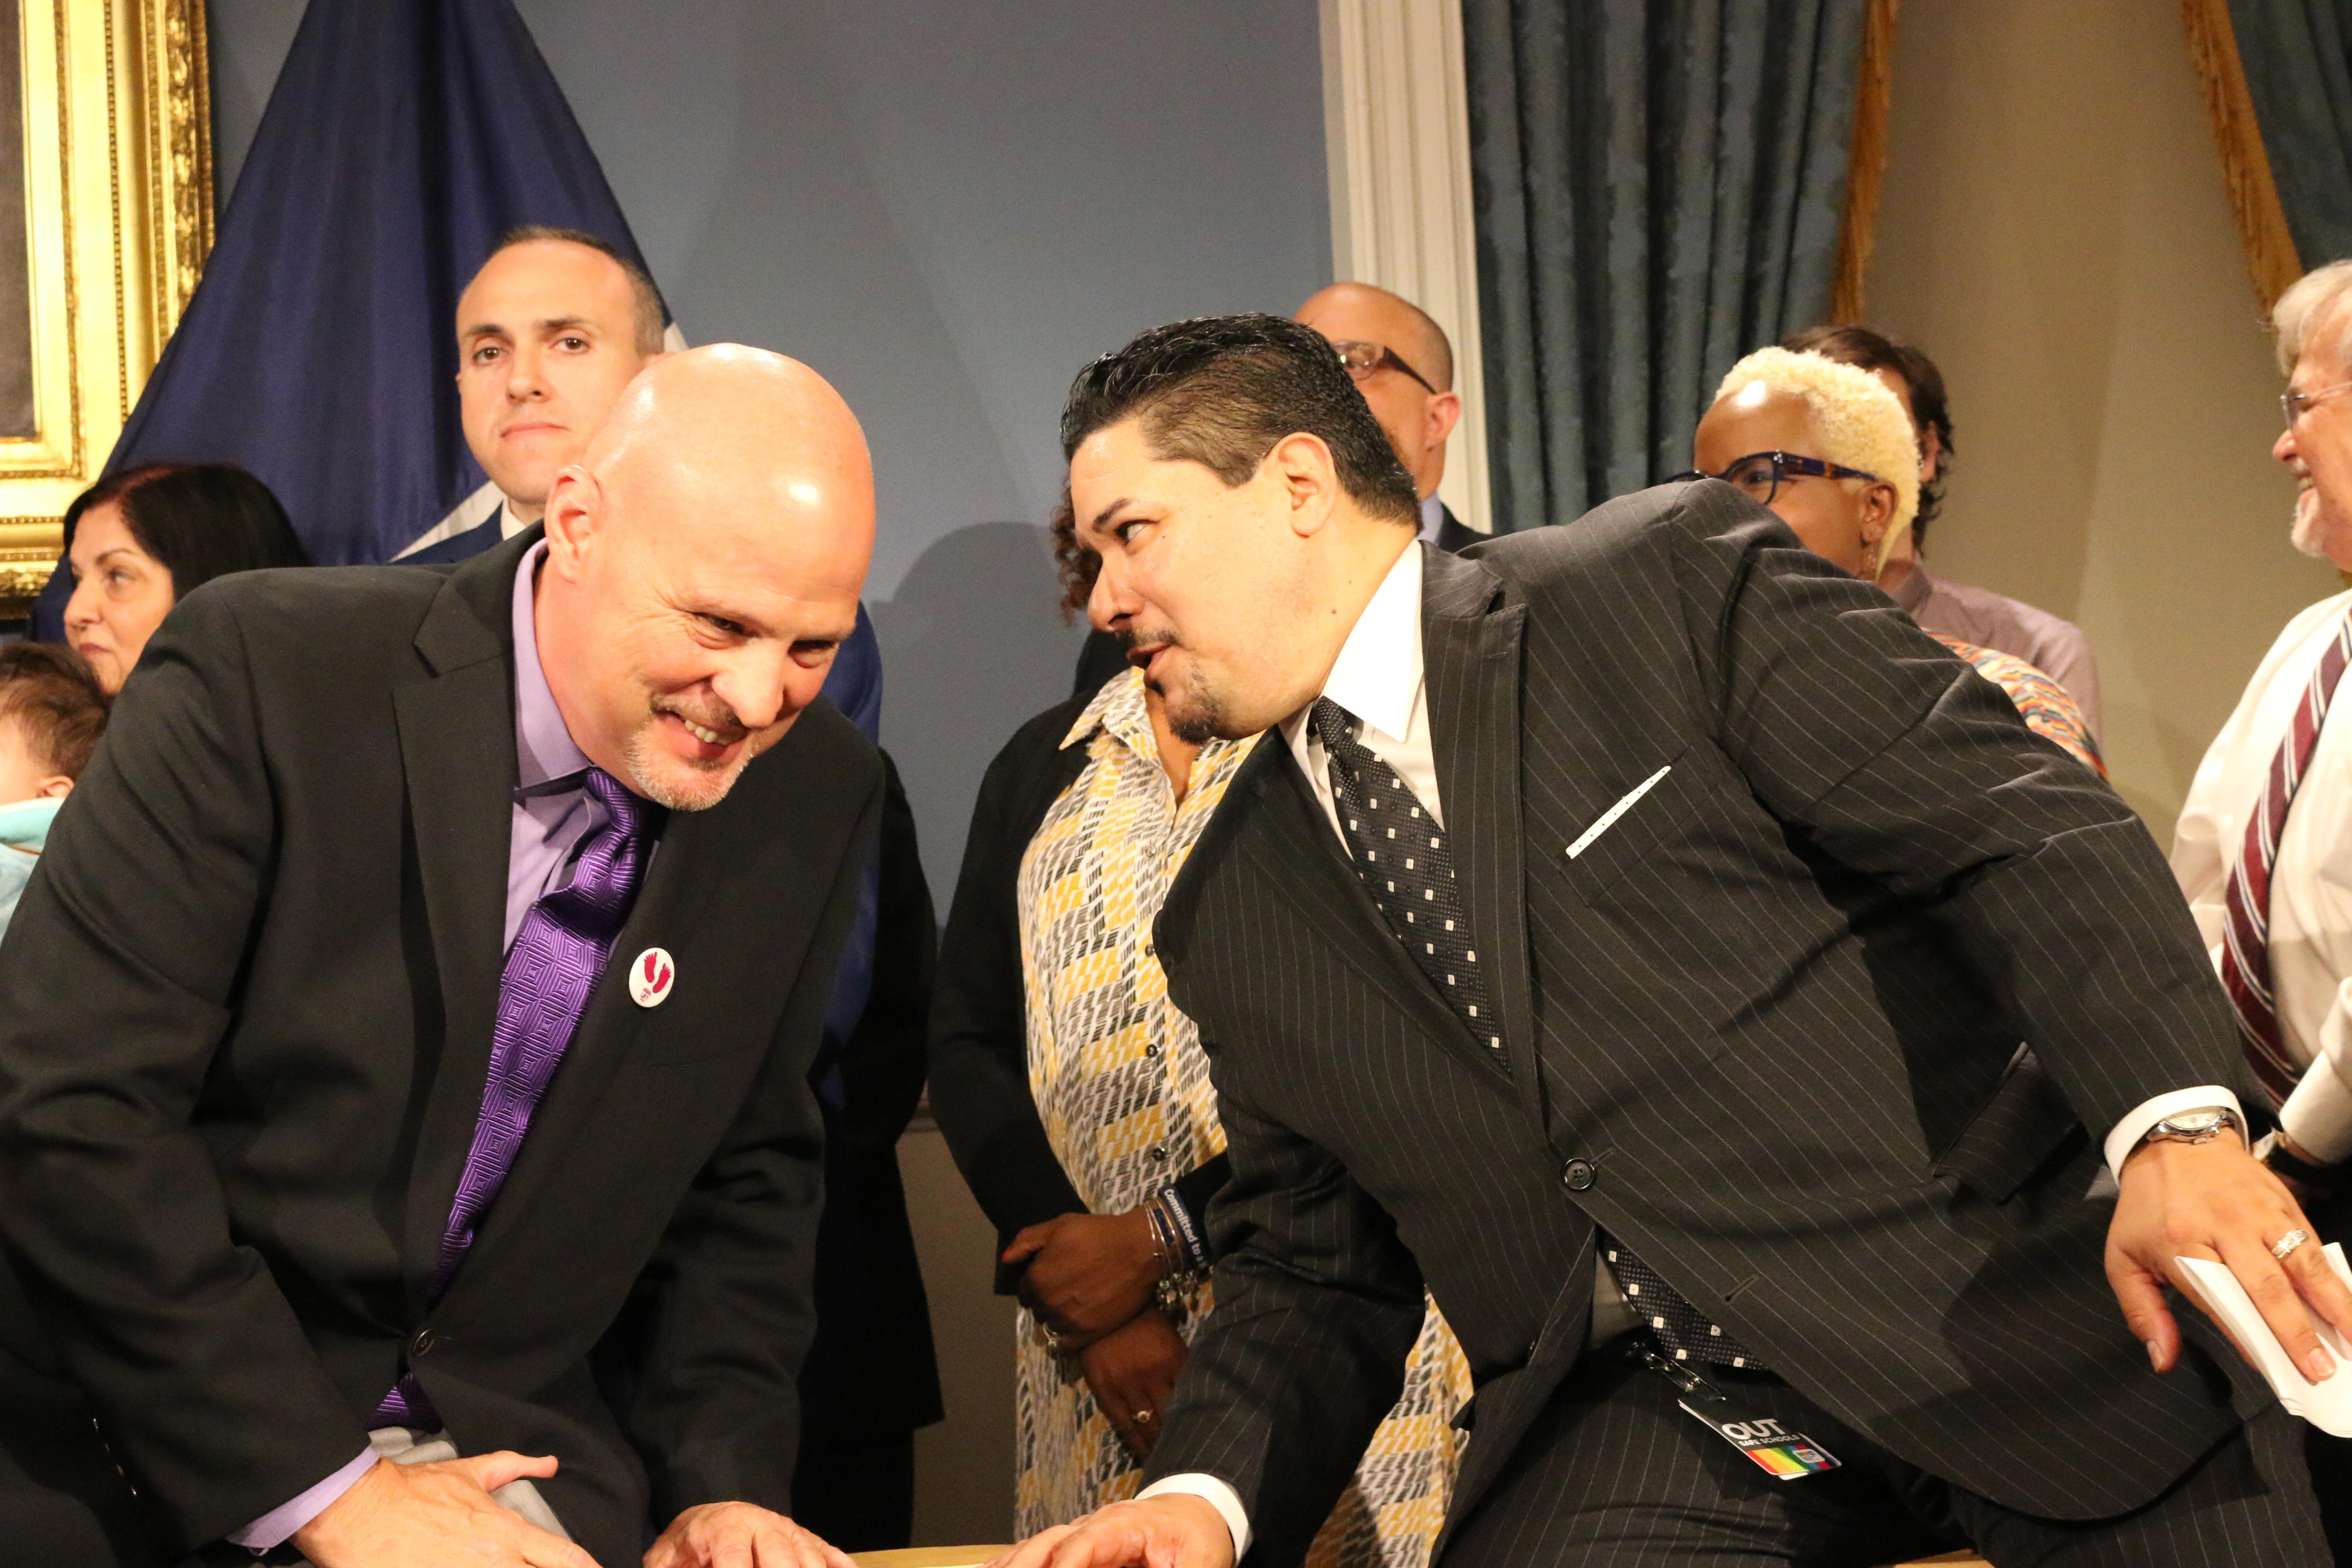 UFT President Michael Mulgrew (right) and schools Chancellor Richard Carranza (left) at a press conference in June.